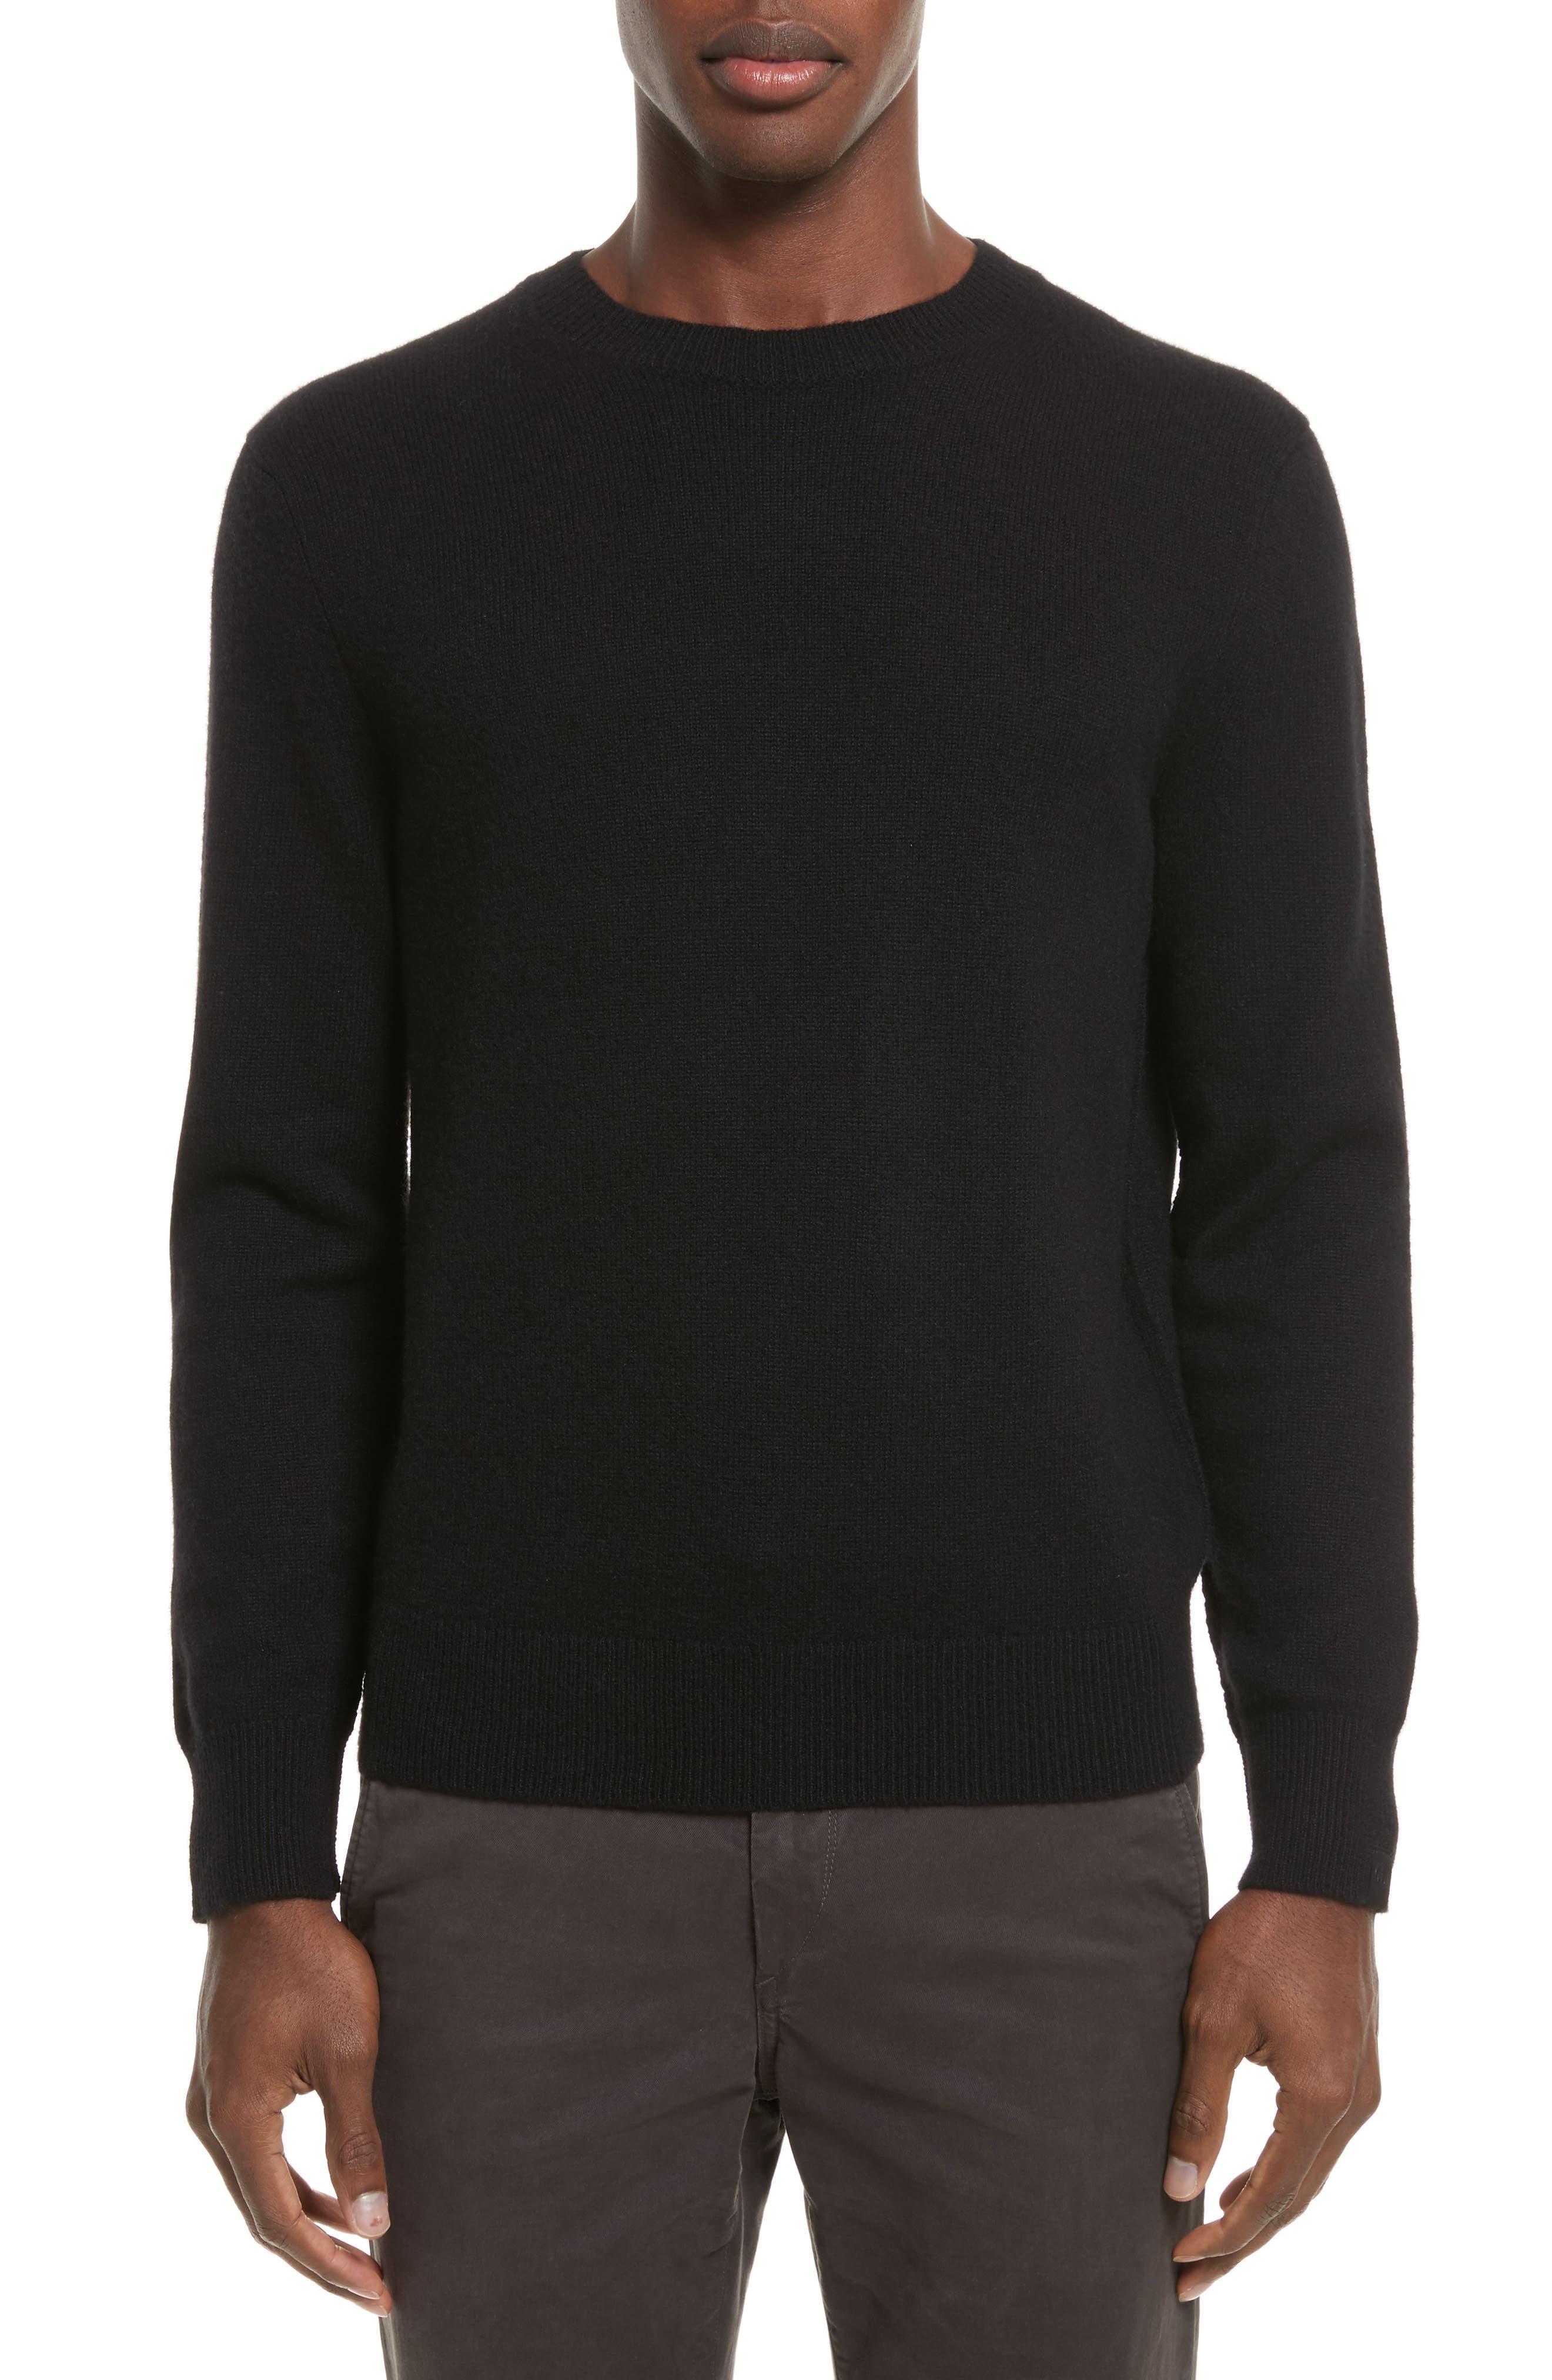 Haldon Cashmere Crewneck Sweatshirt,                         Main,                         color, Black